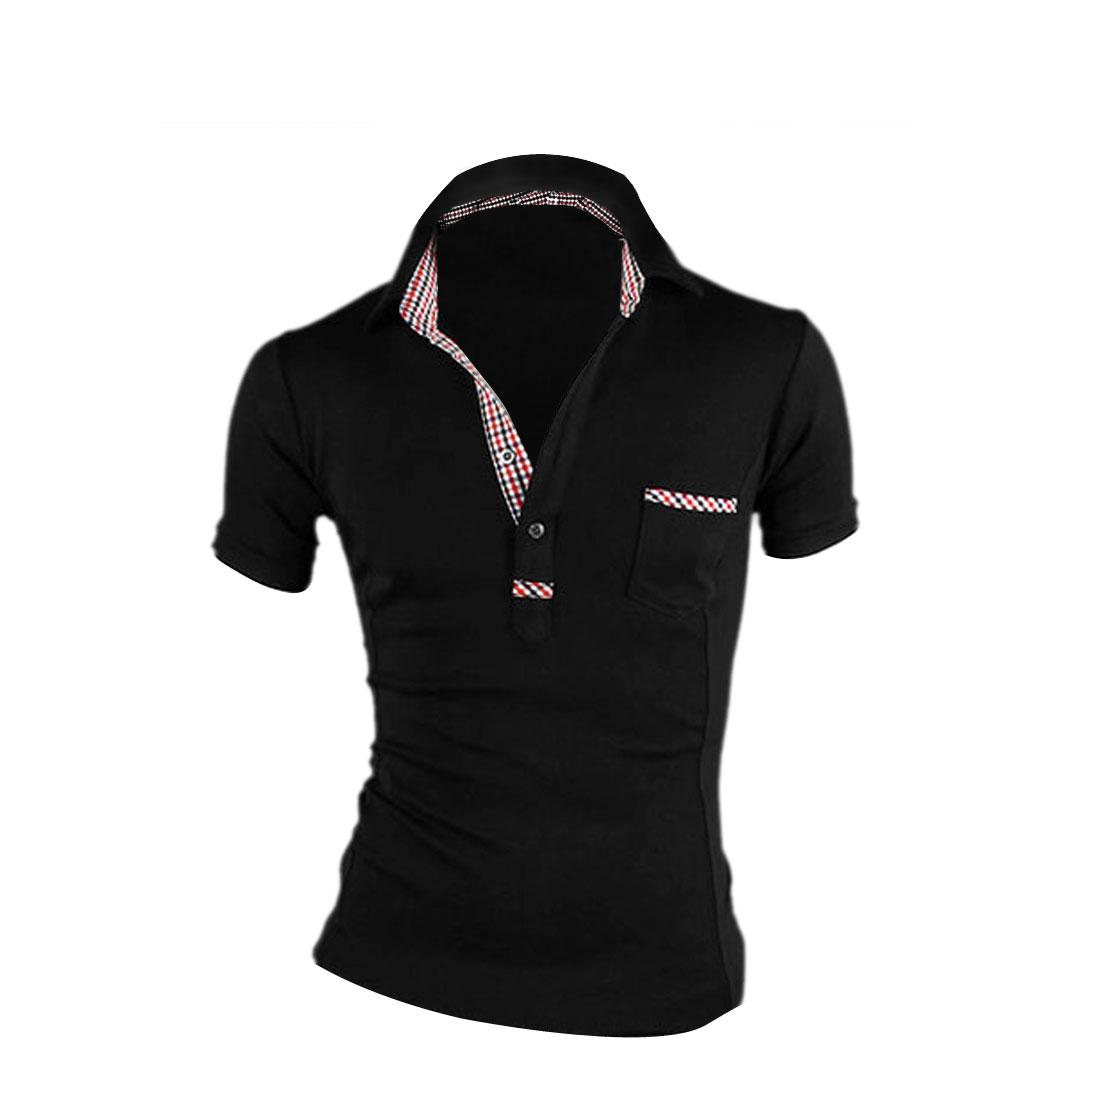 Man New Fashion Chest Patch Pocket Design Black Summer Polo Shirt M